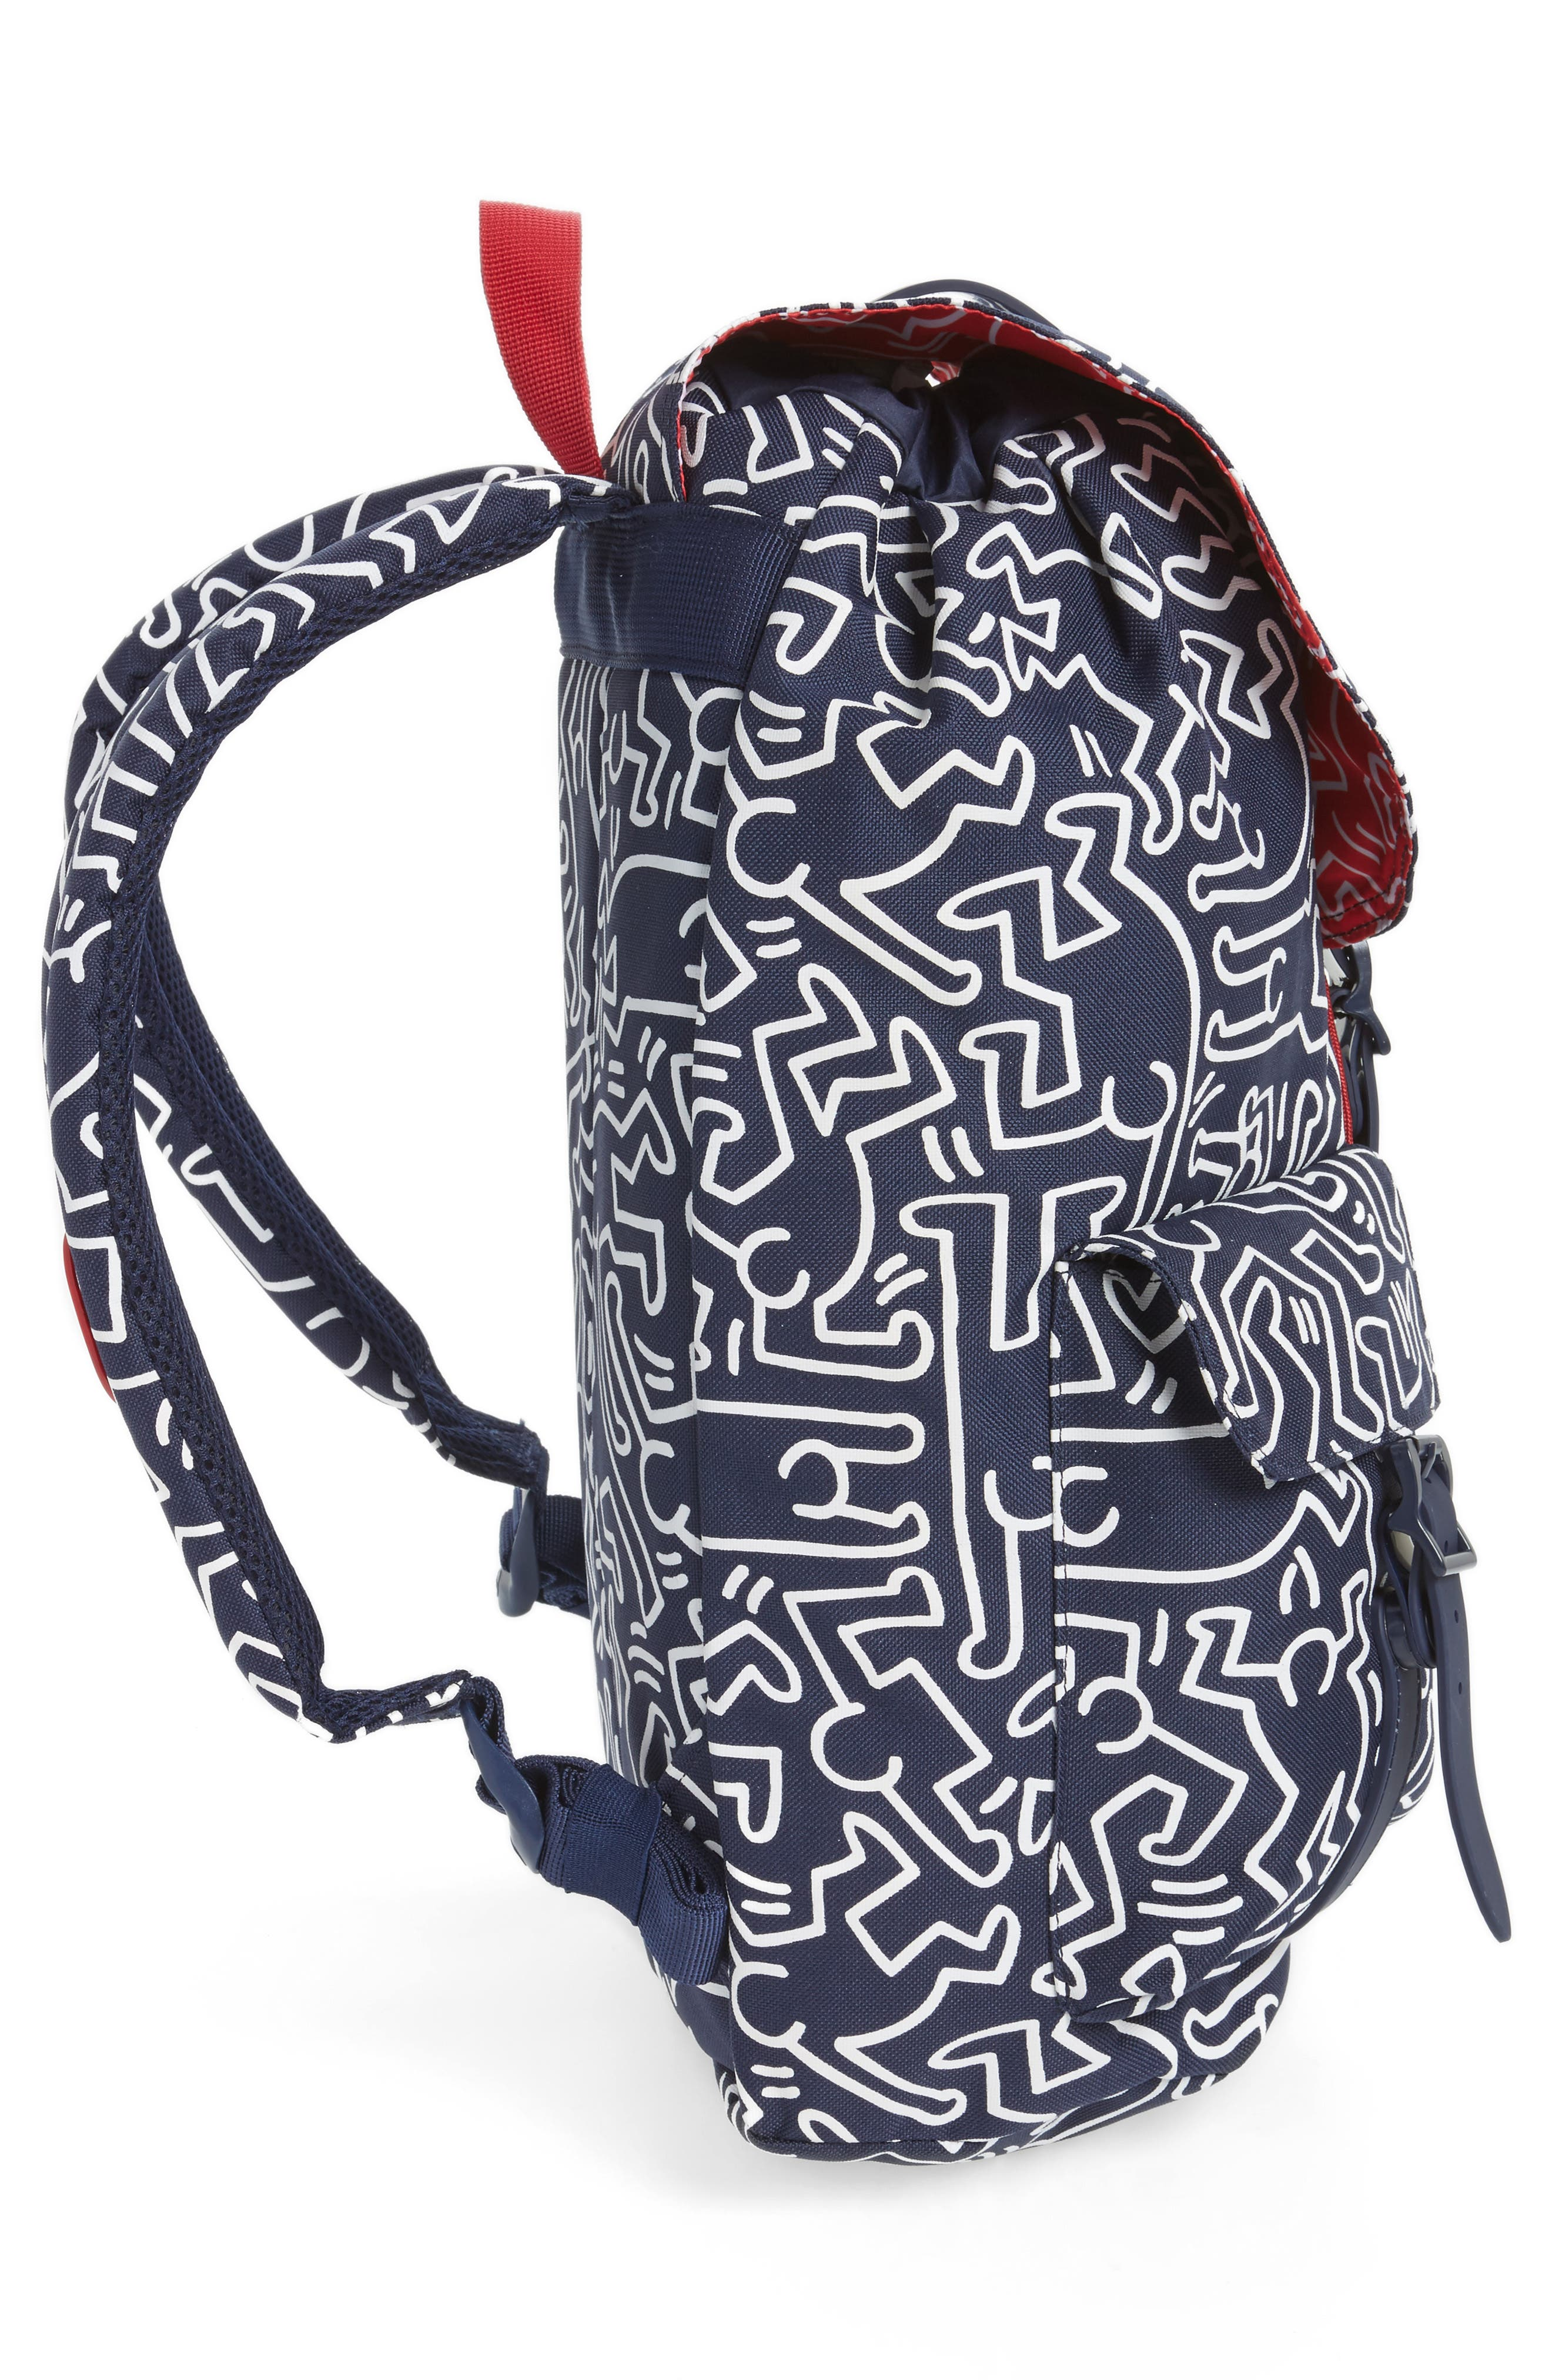 Dawson Keith Haring Backpack,                             Alternate thumbnail 5, color,                             Peacoat Navy